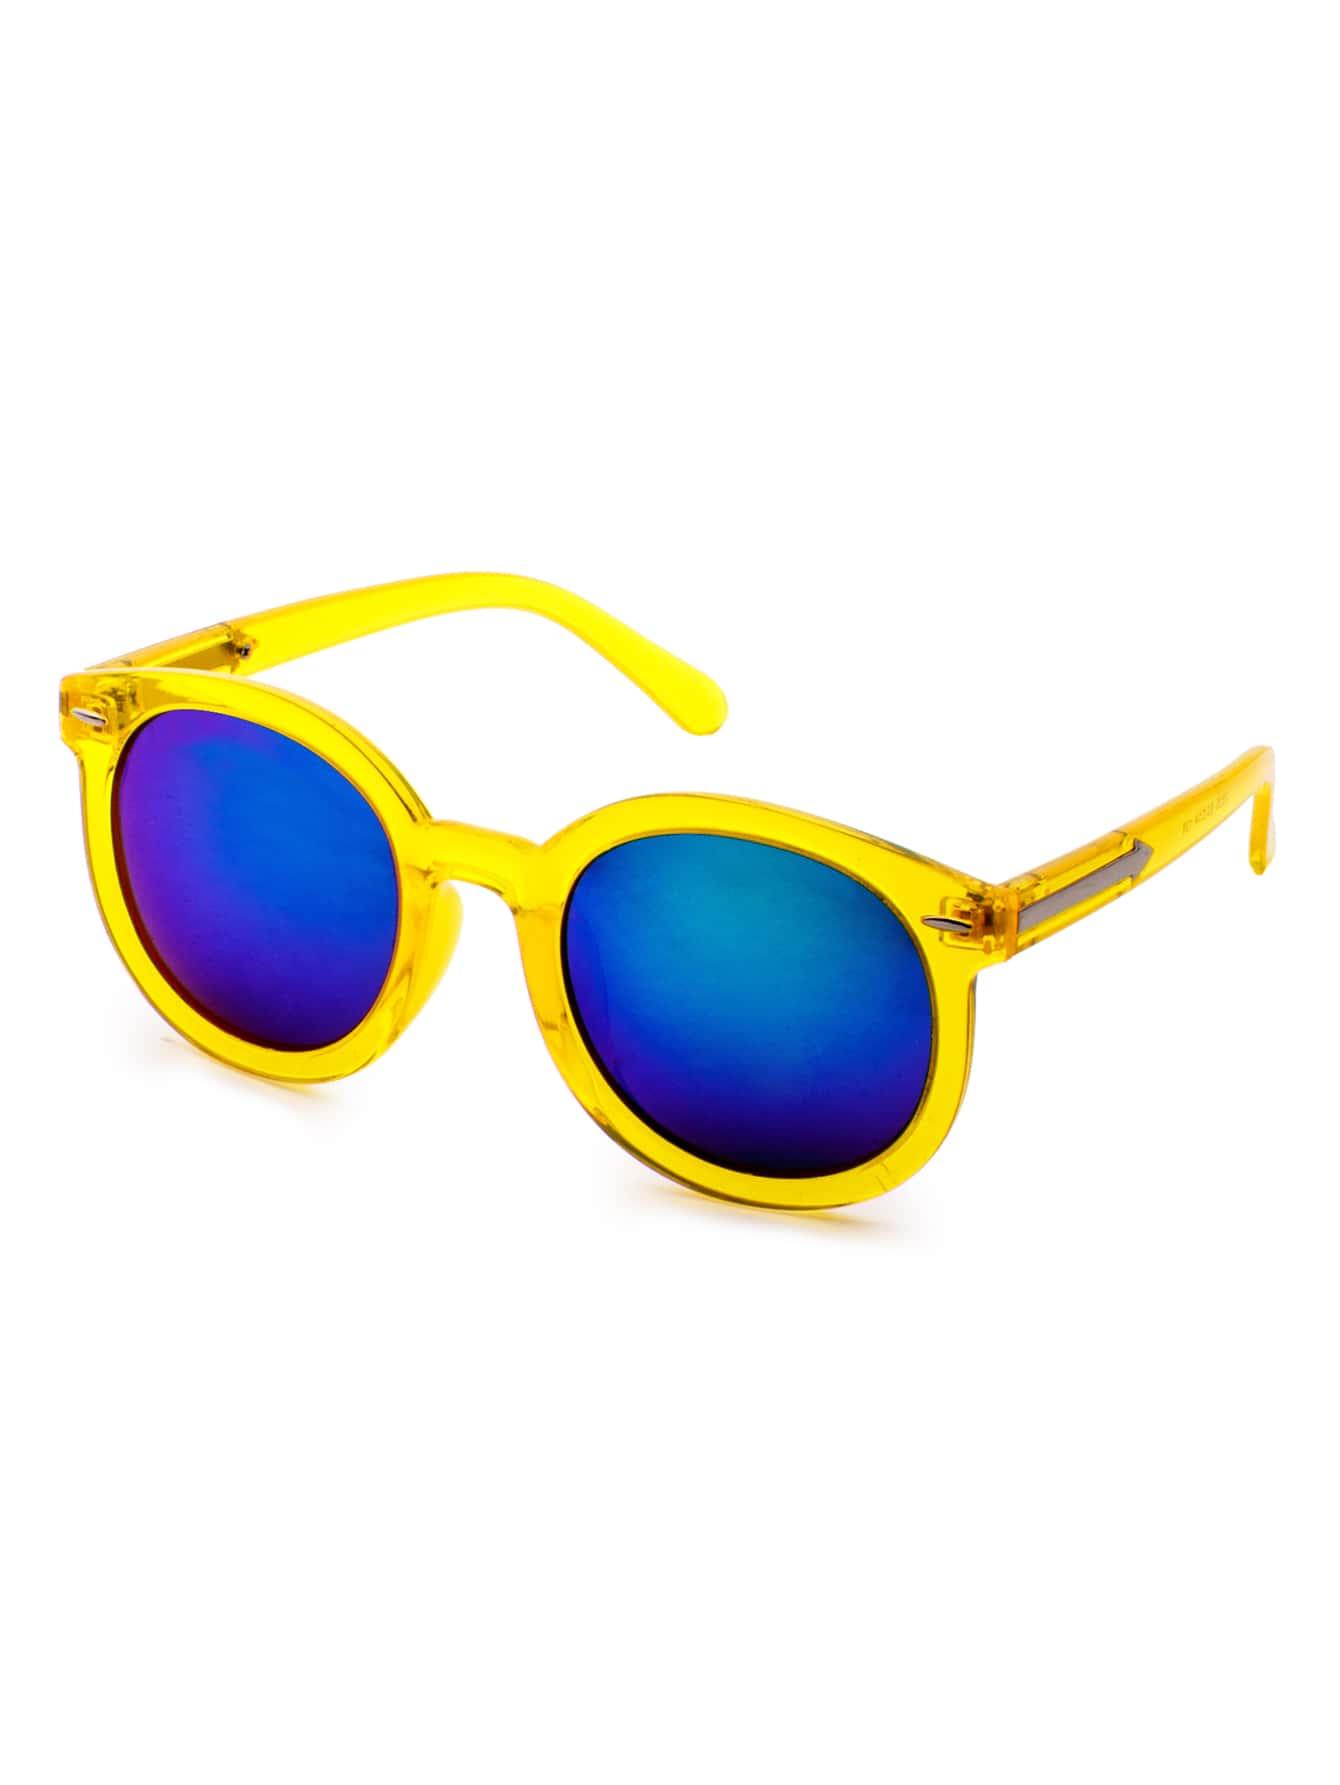 Yellow Frame Blue Lens Casual Sunglasses